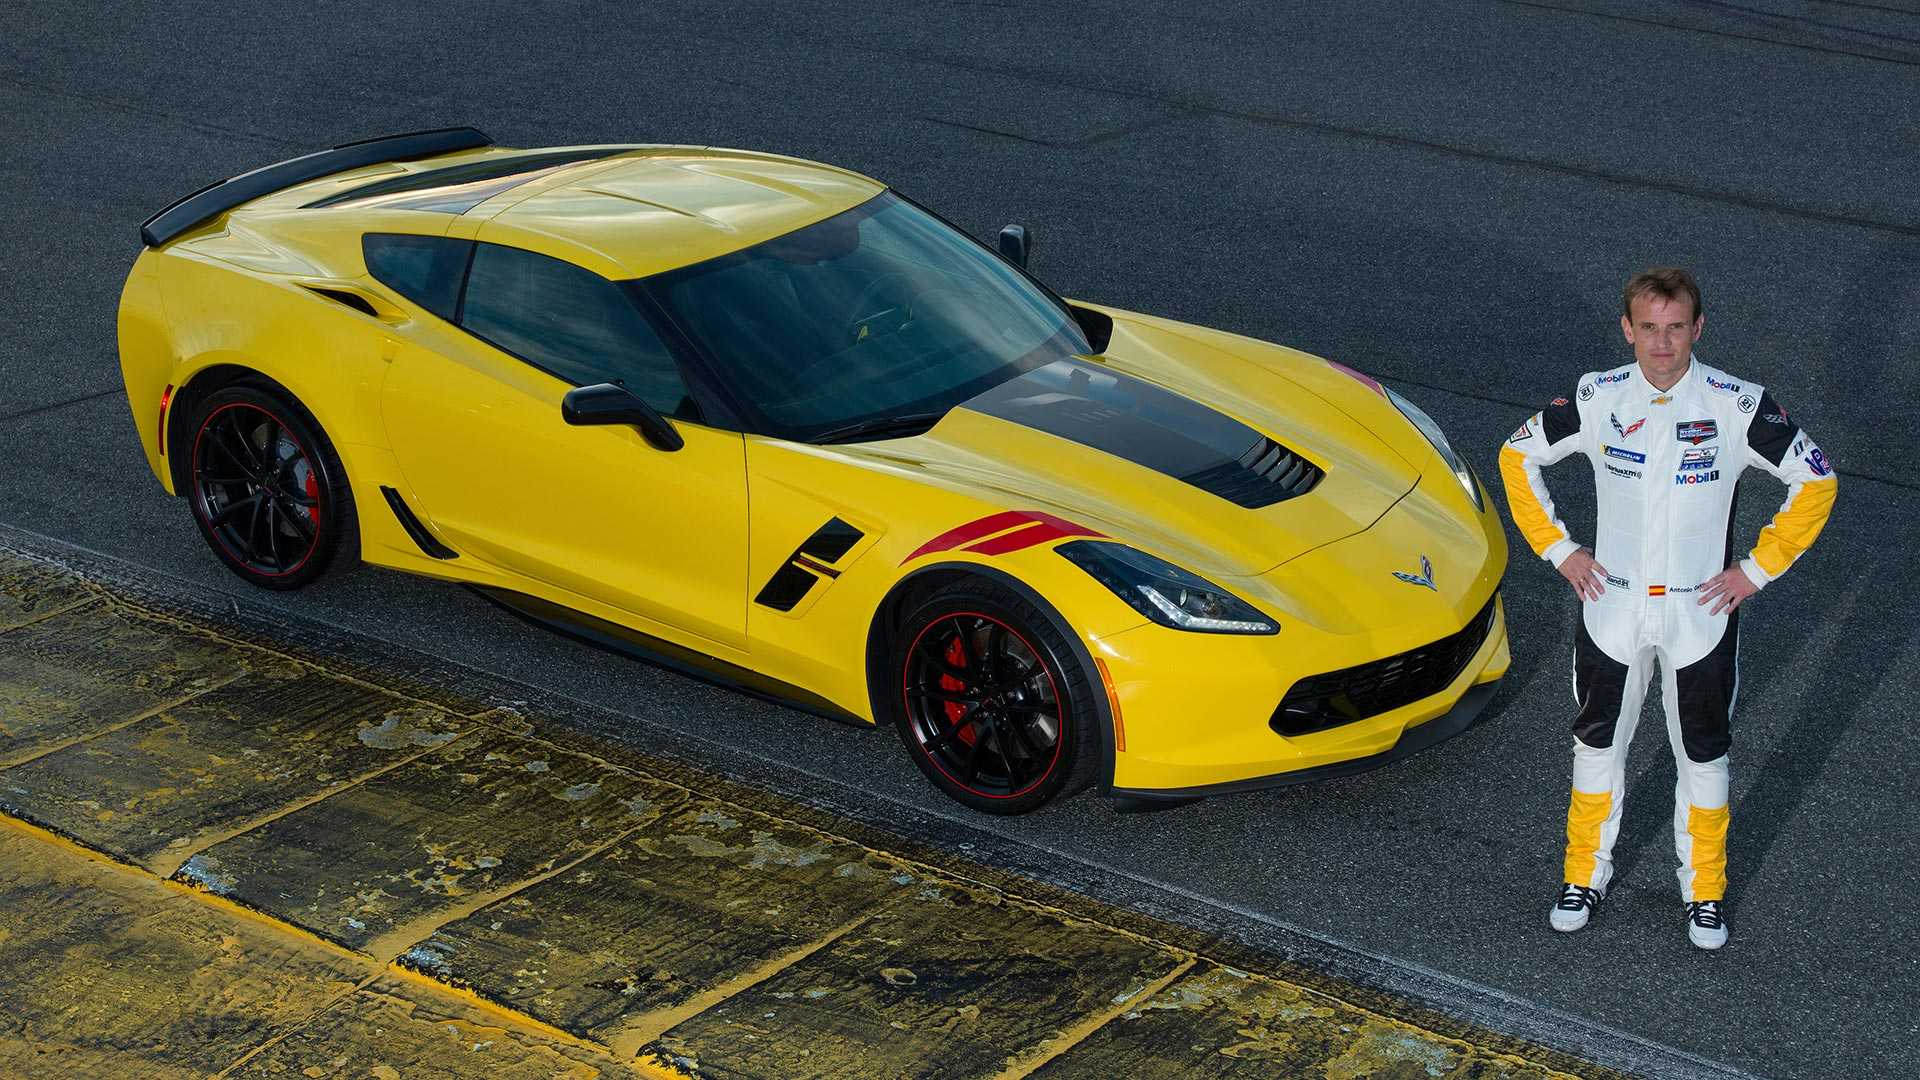 2019_Chevrolet_Corvette_Drivers_Series_Editions_0003